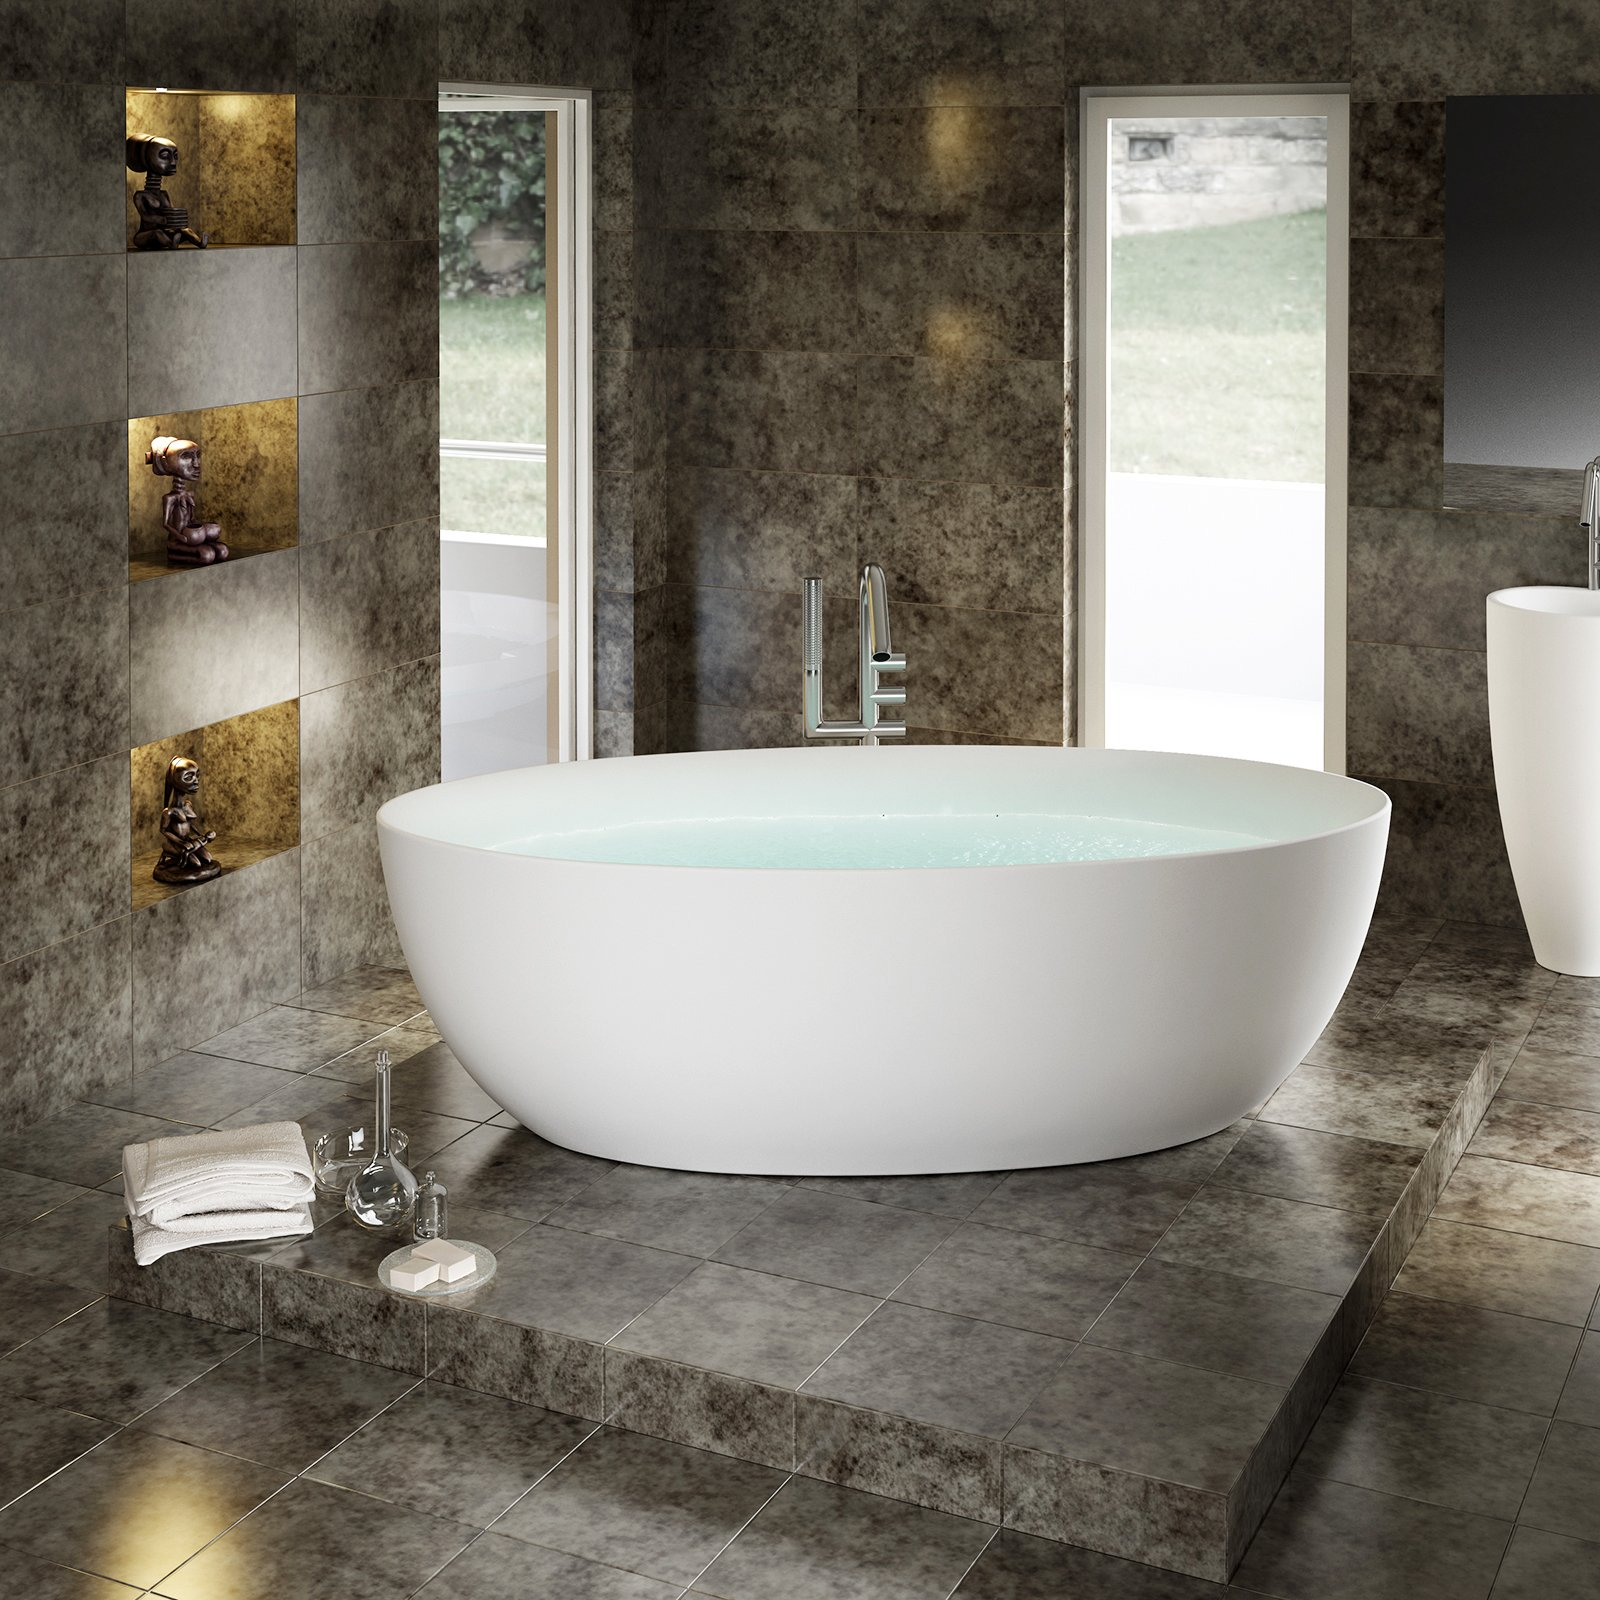 Freistehende Badewanne TERRA Acryl - 186 x 88 cm - Weiß glänzend zoom thumbnail 4